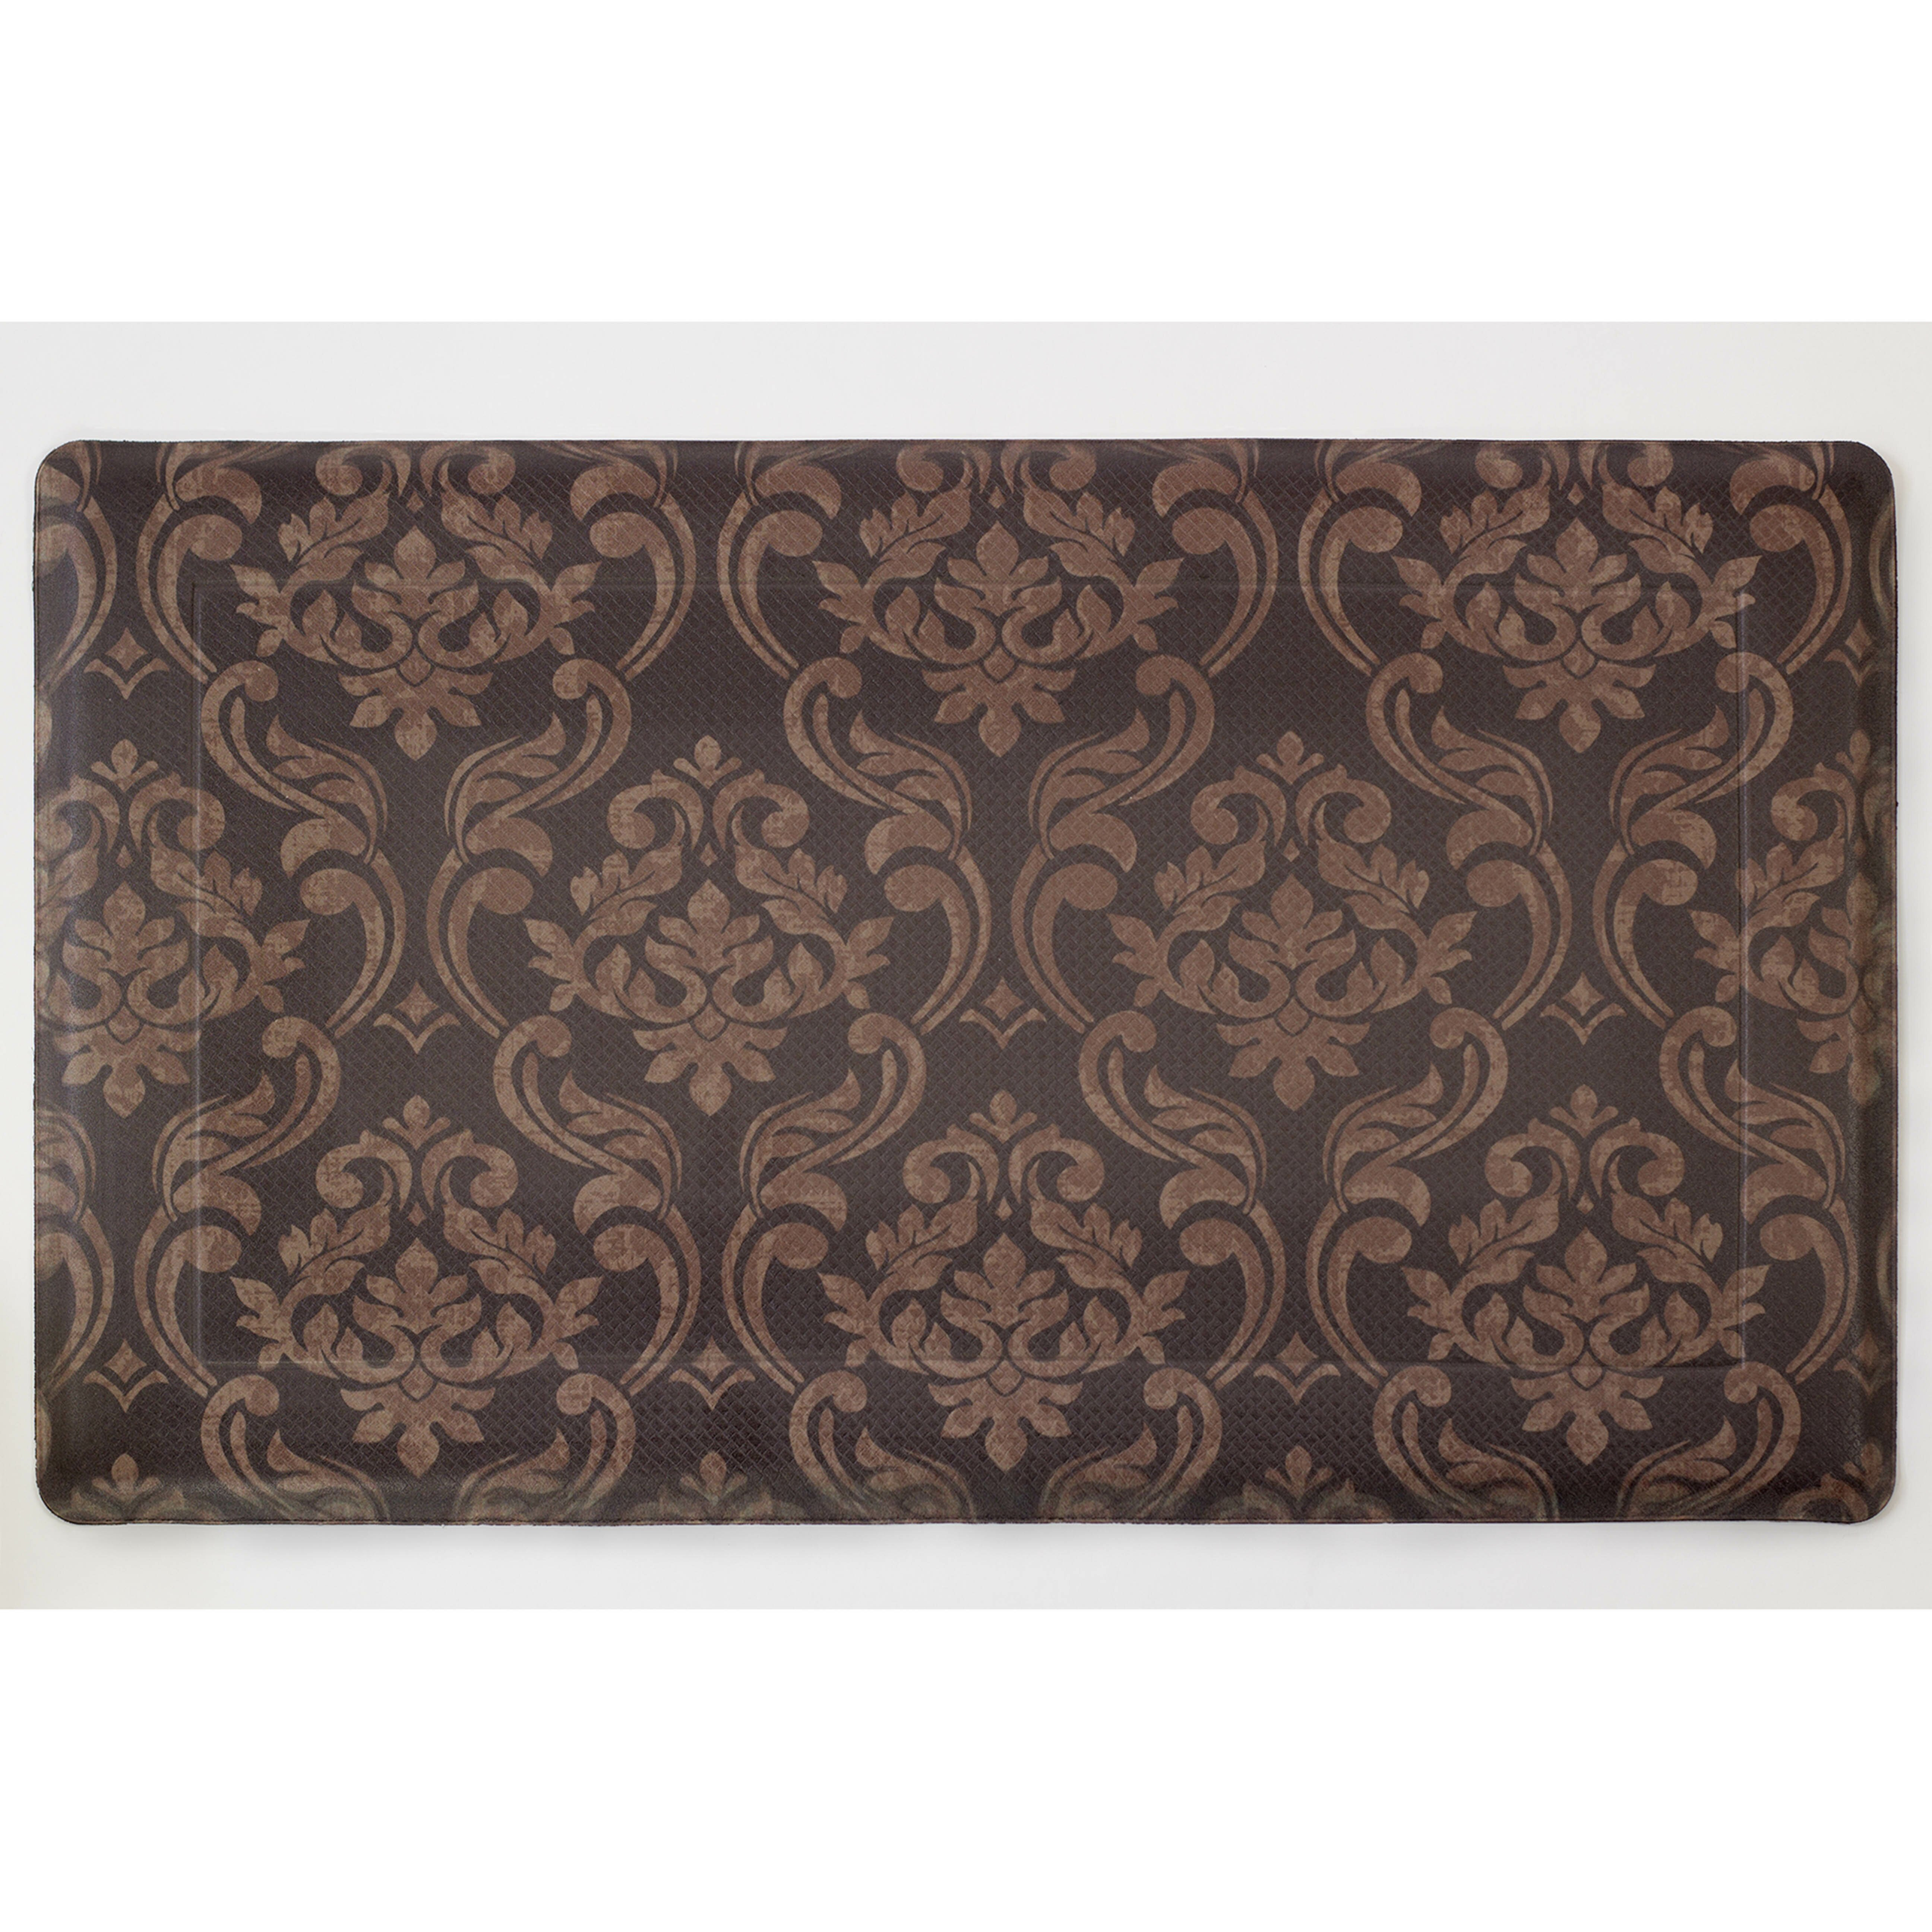 Memory Foam Kitchen Rugs: Chef Gear Chocolate Linen Anti-Fatigue Printed Memory Foam